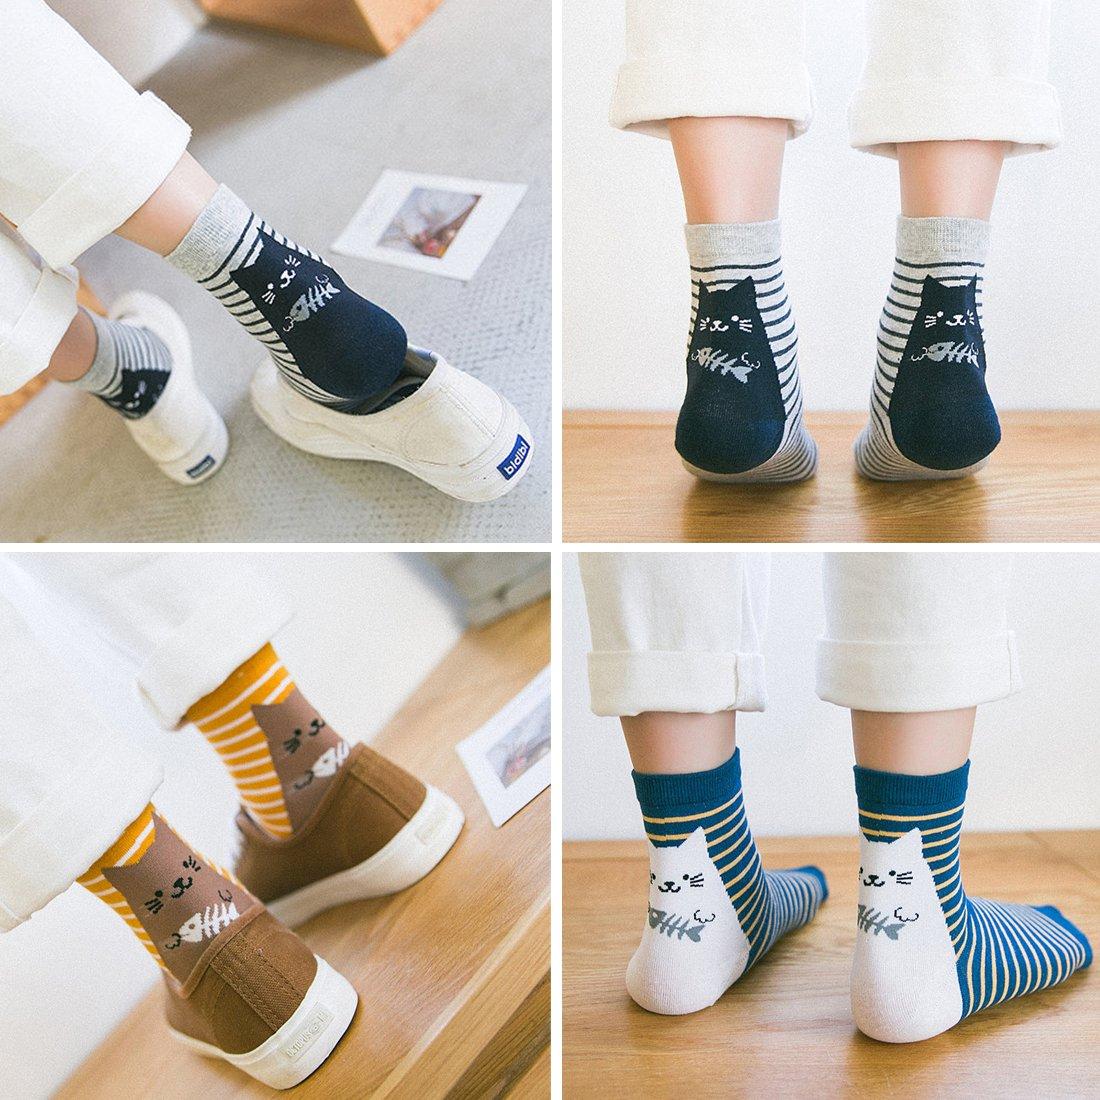 a885c38f58697 LOTUYACY Womens Girls Cute Animal Casual Socks Comfort Funny Cotton Crew  Socks 4 Or 5 Pack BT-UX5U-5FXX Christmas gift